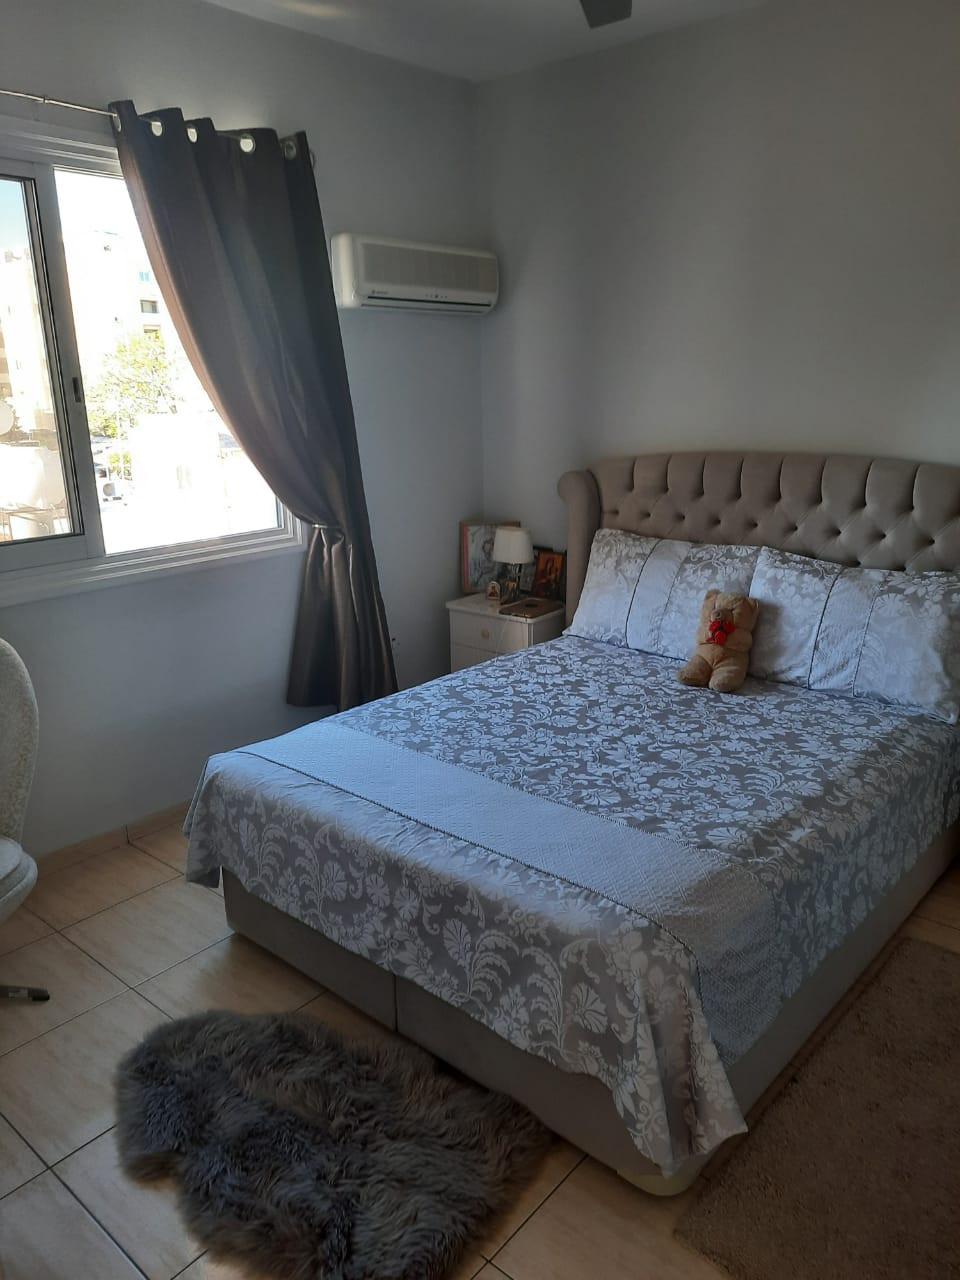 FC-33497: Apartment (Flat) in Mackenzie, Larnaca for Sale - #8